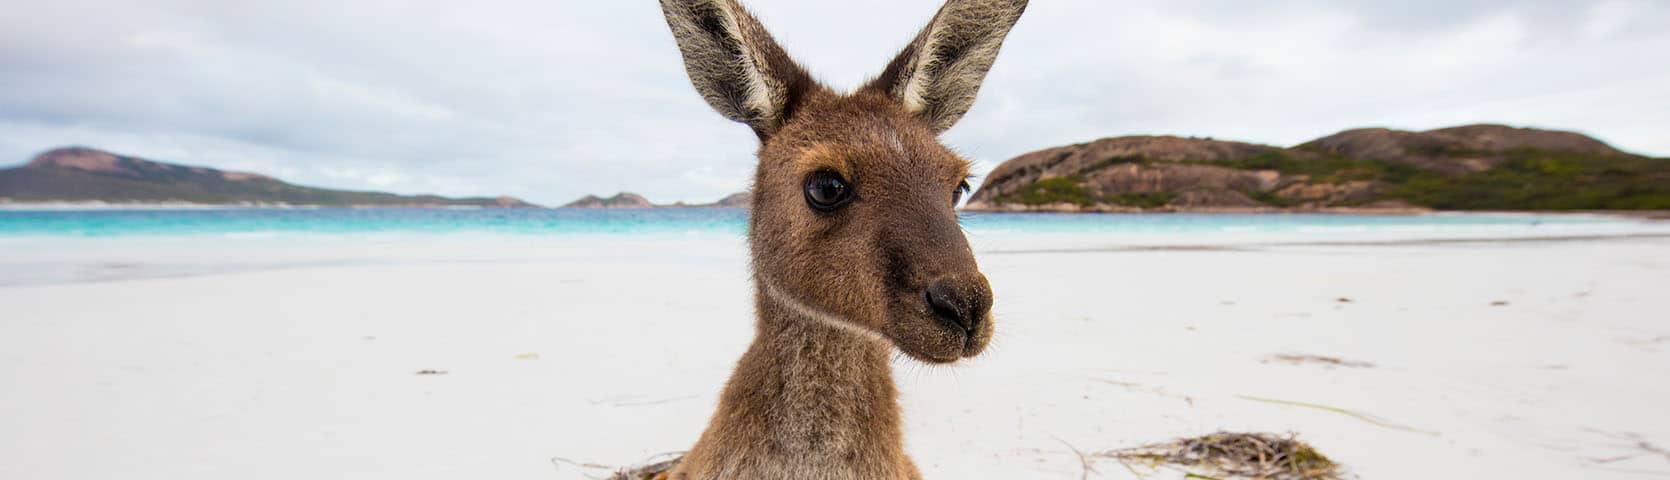 Across the Great Australian Bight - Adelaide - Fremantle